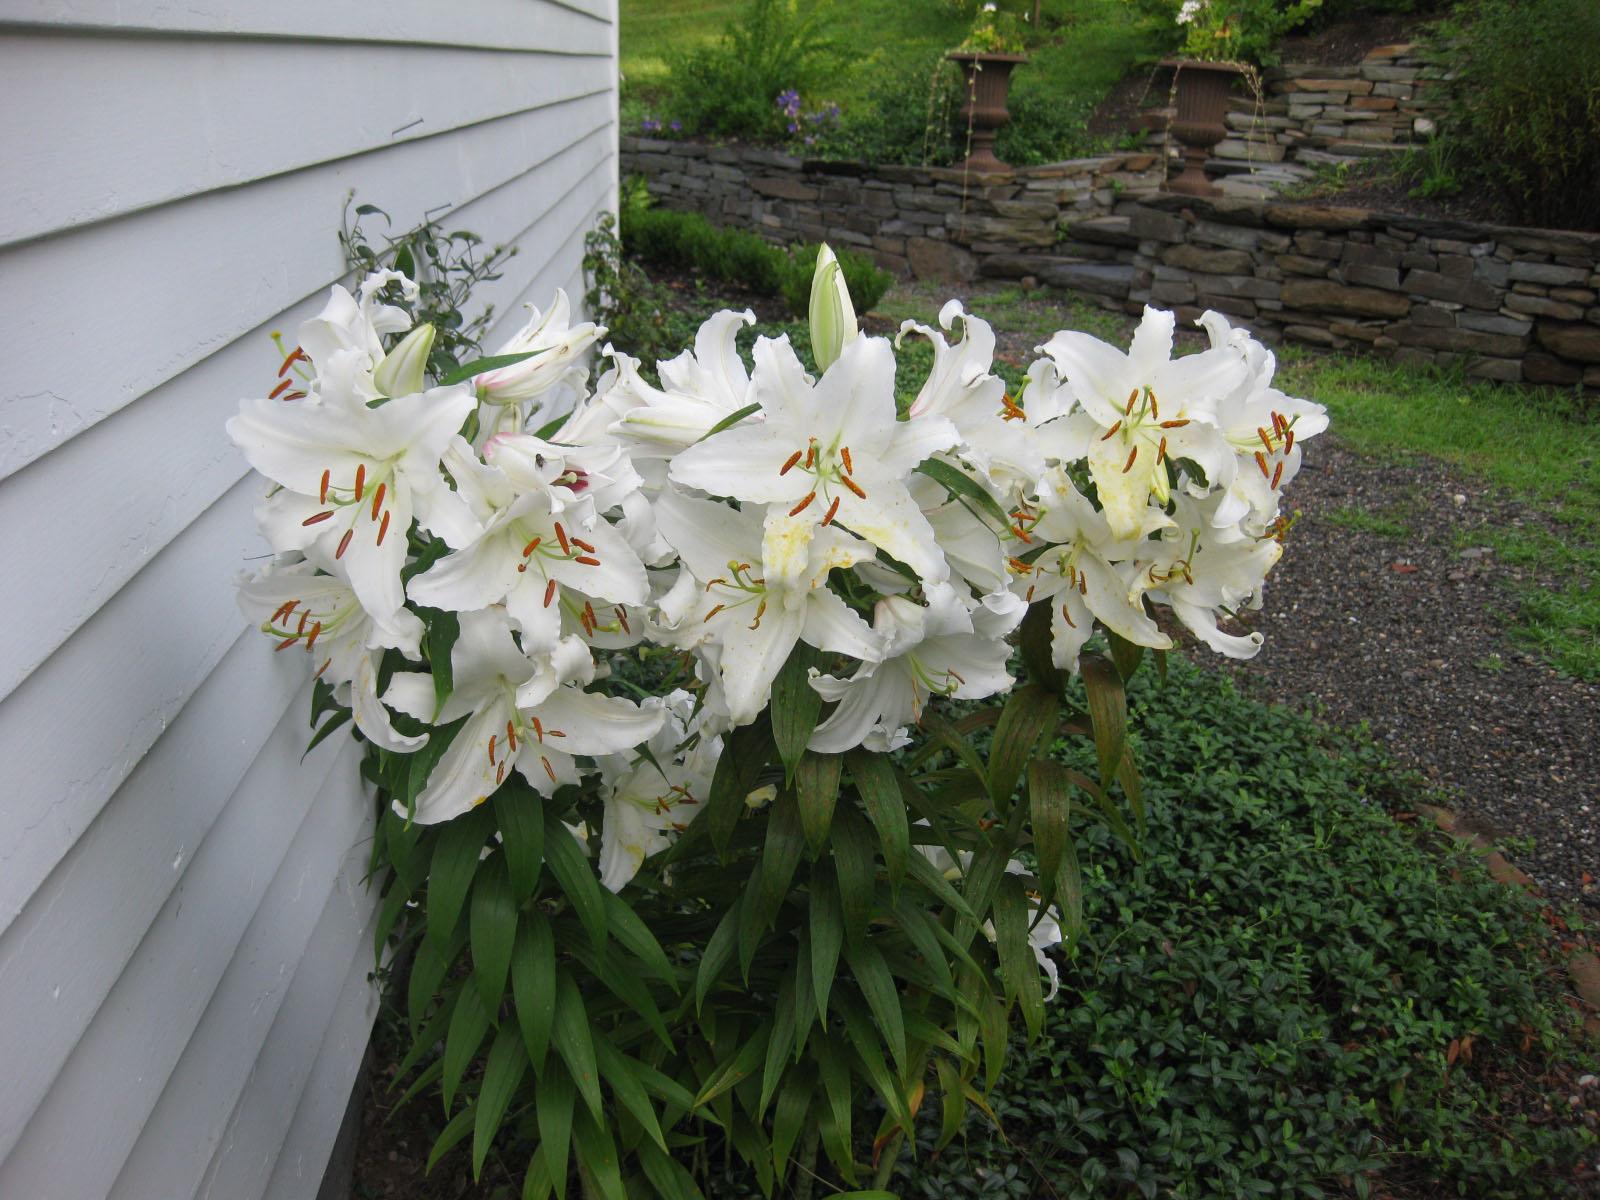 Towering Treasures: Oriental Hybrid Lilium